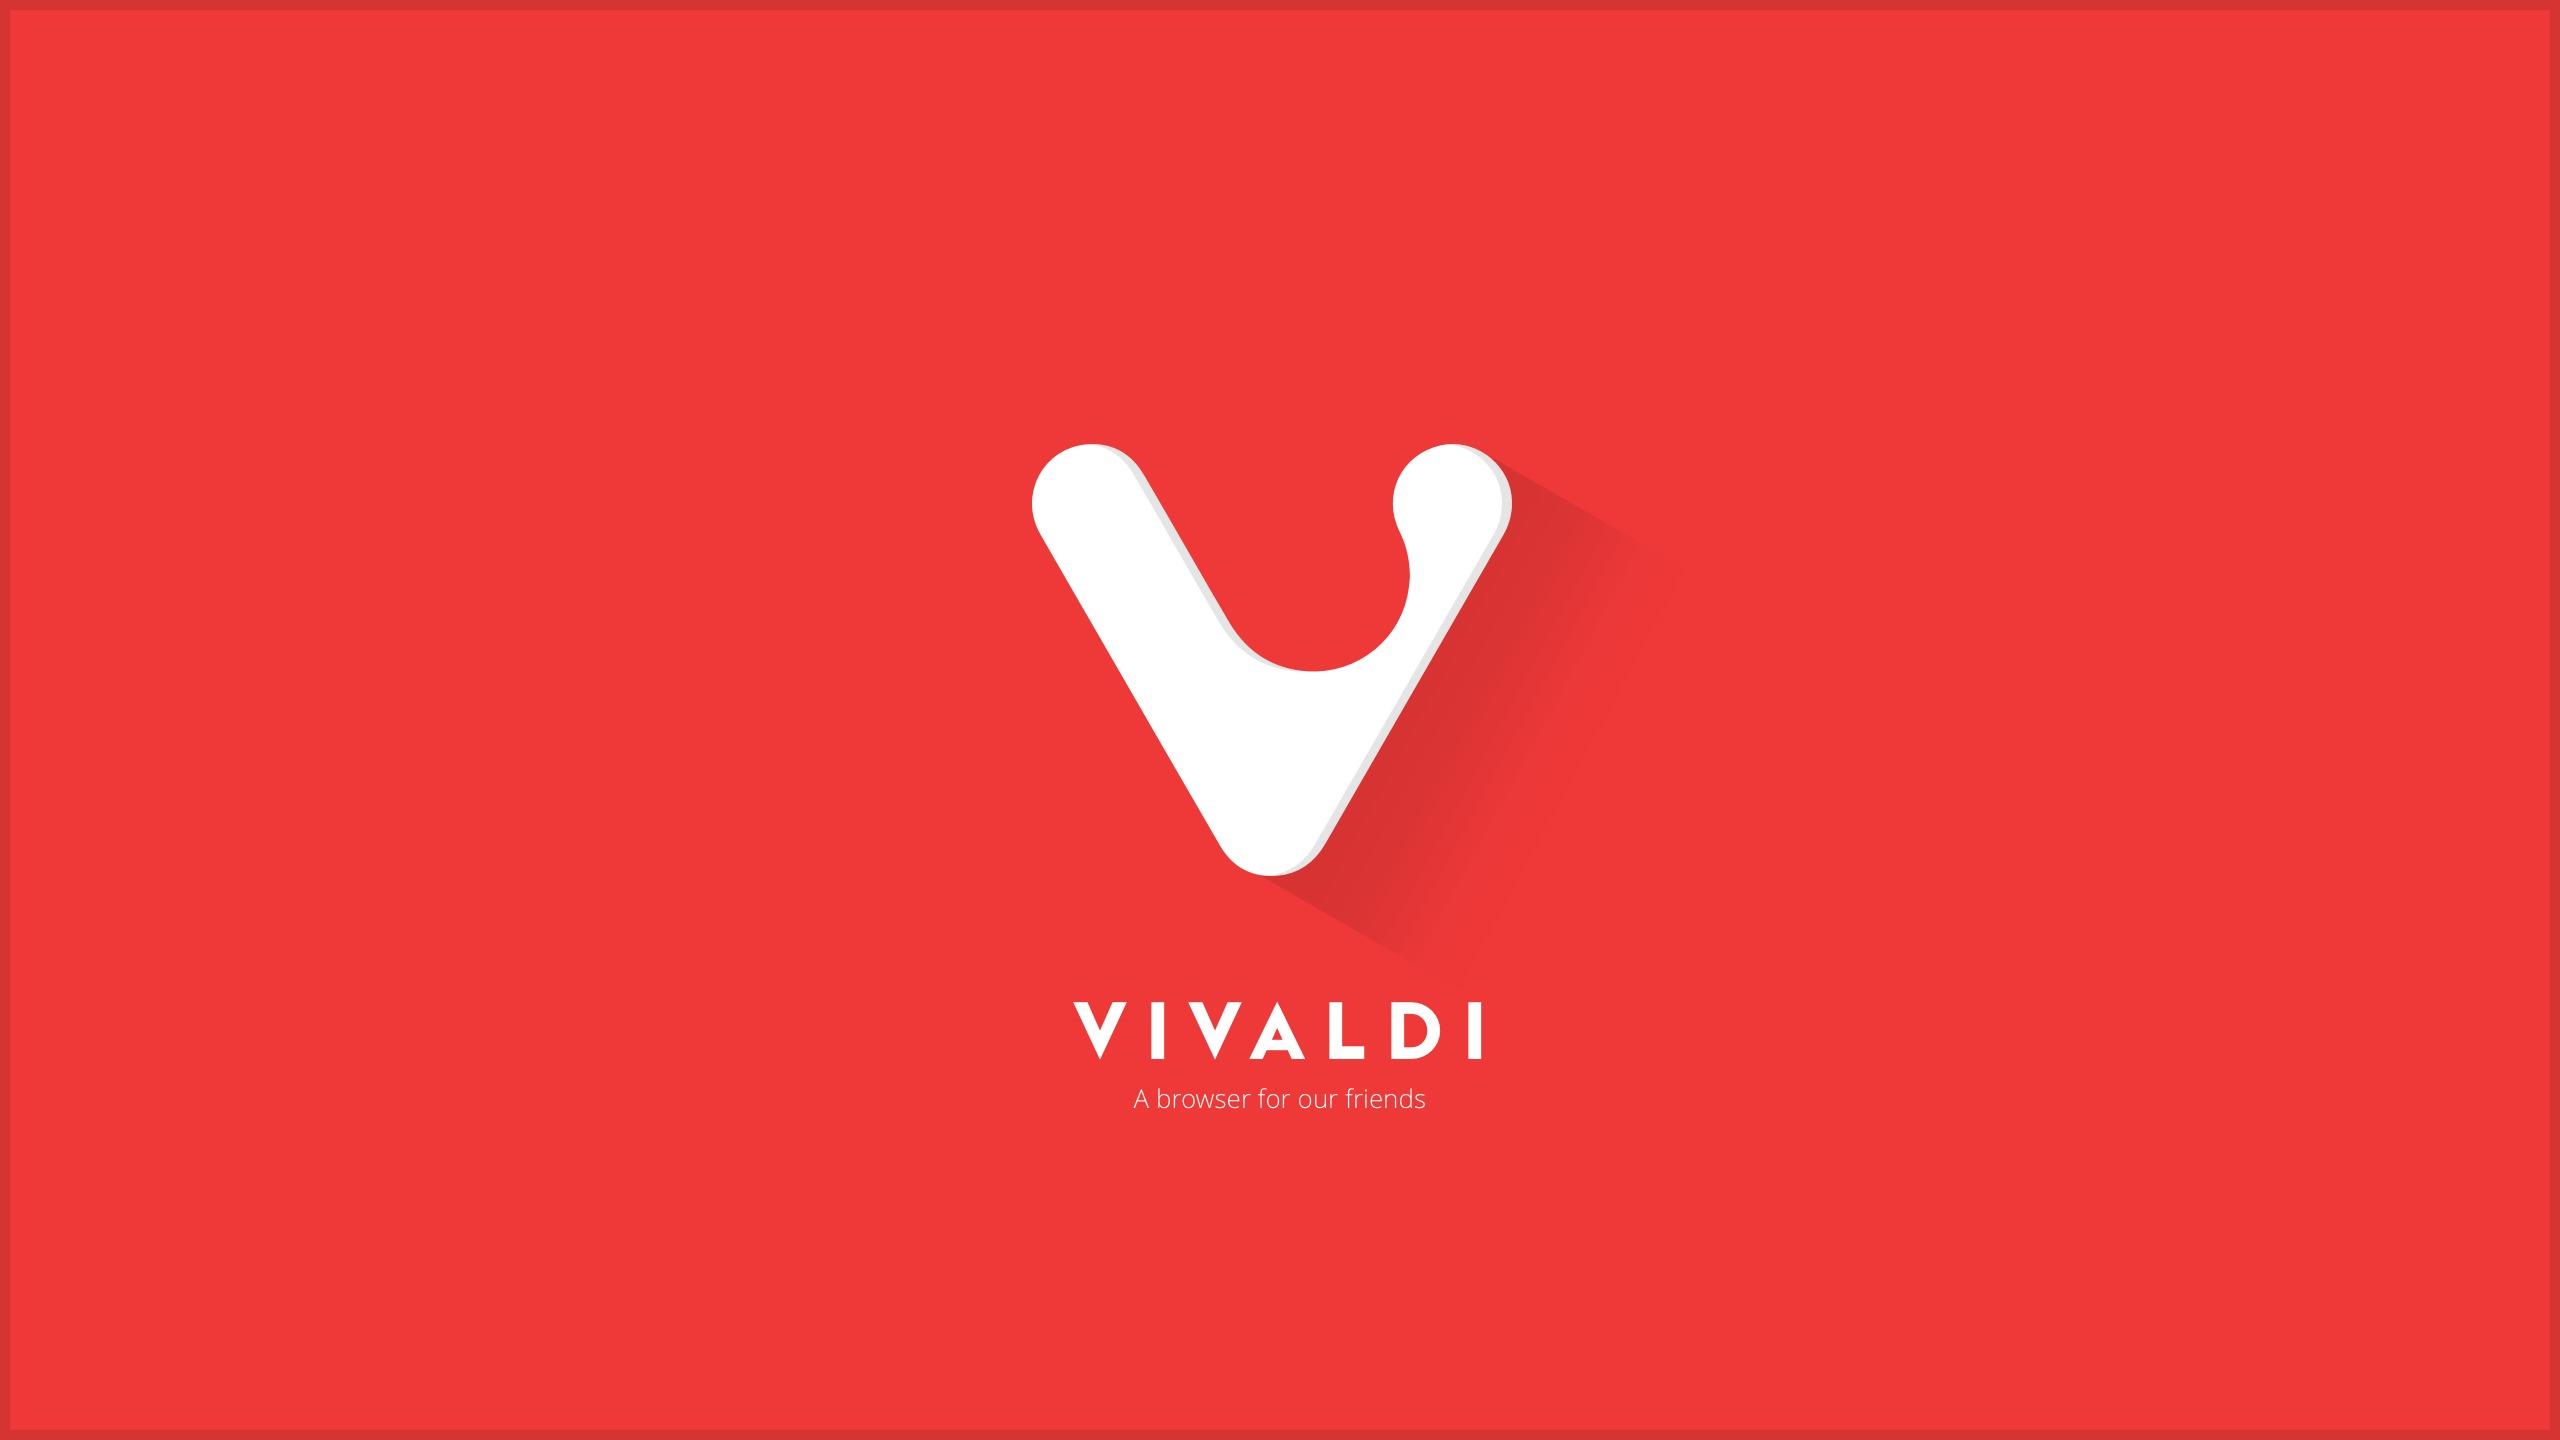 Vivaldi. Браузер будущего.